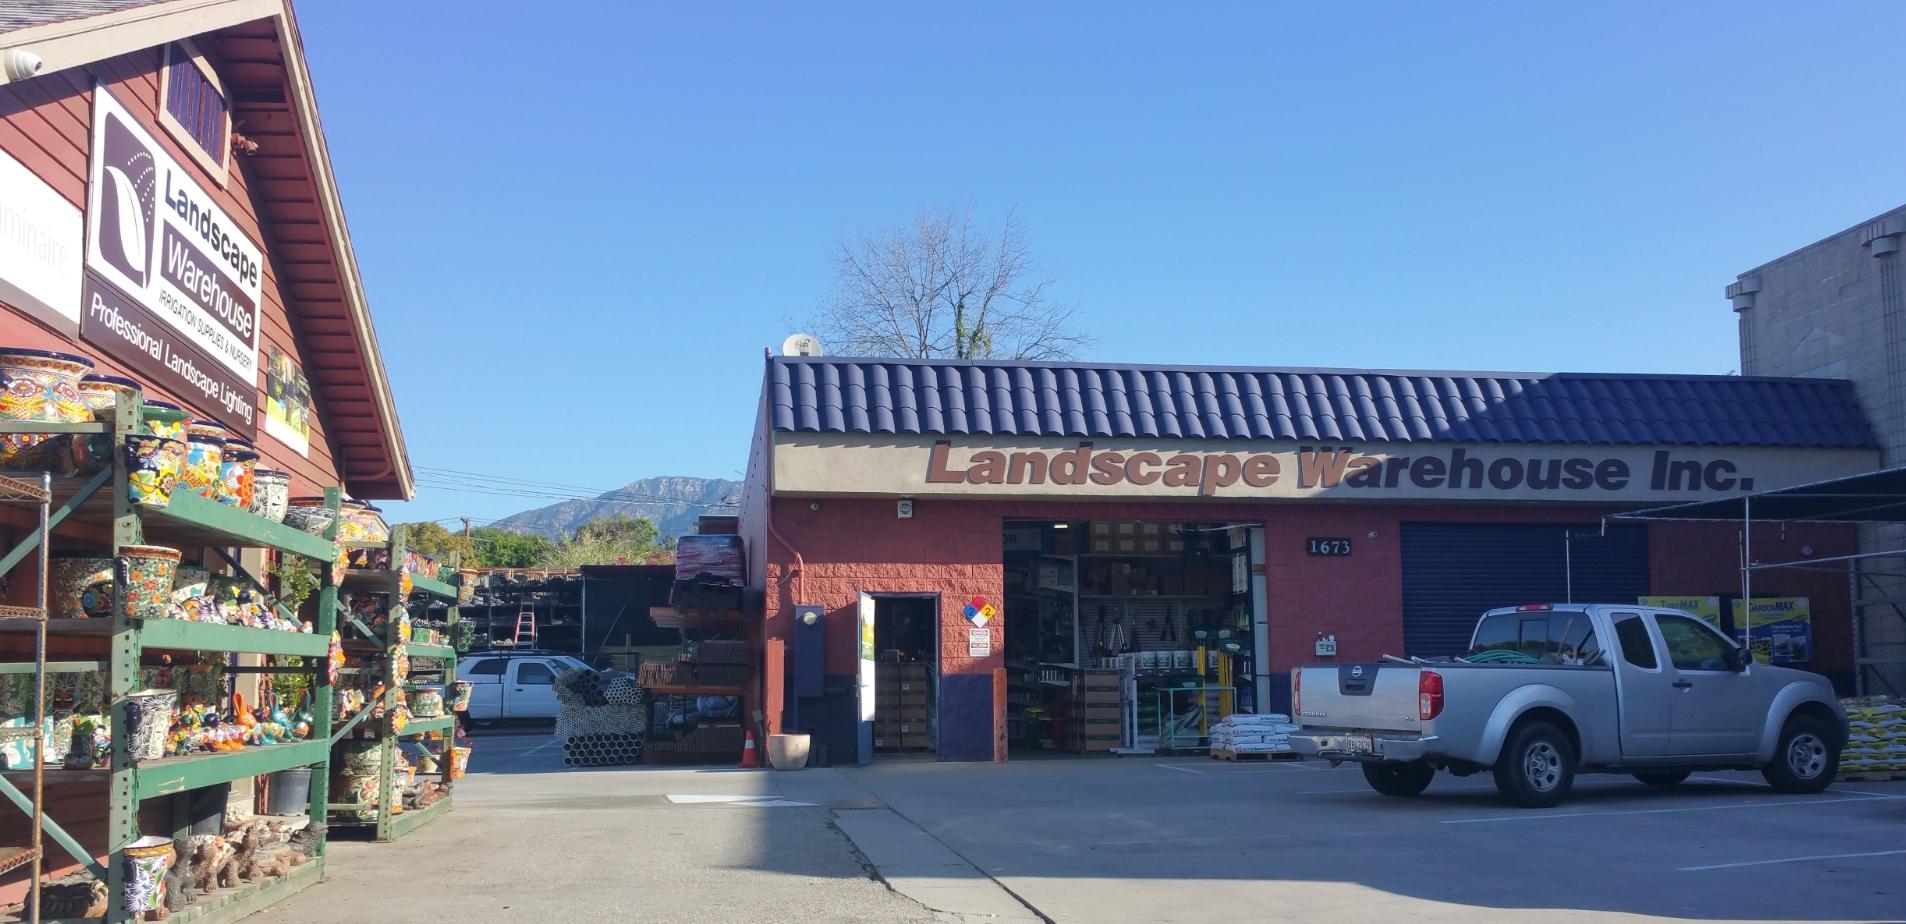 landscape-warehouse-pasadena